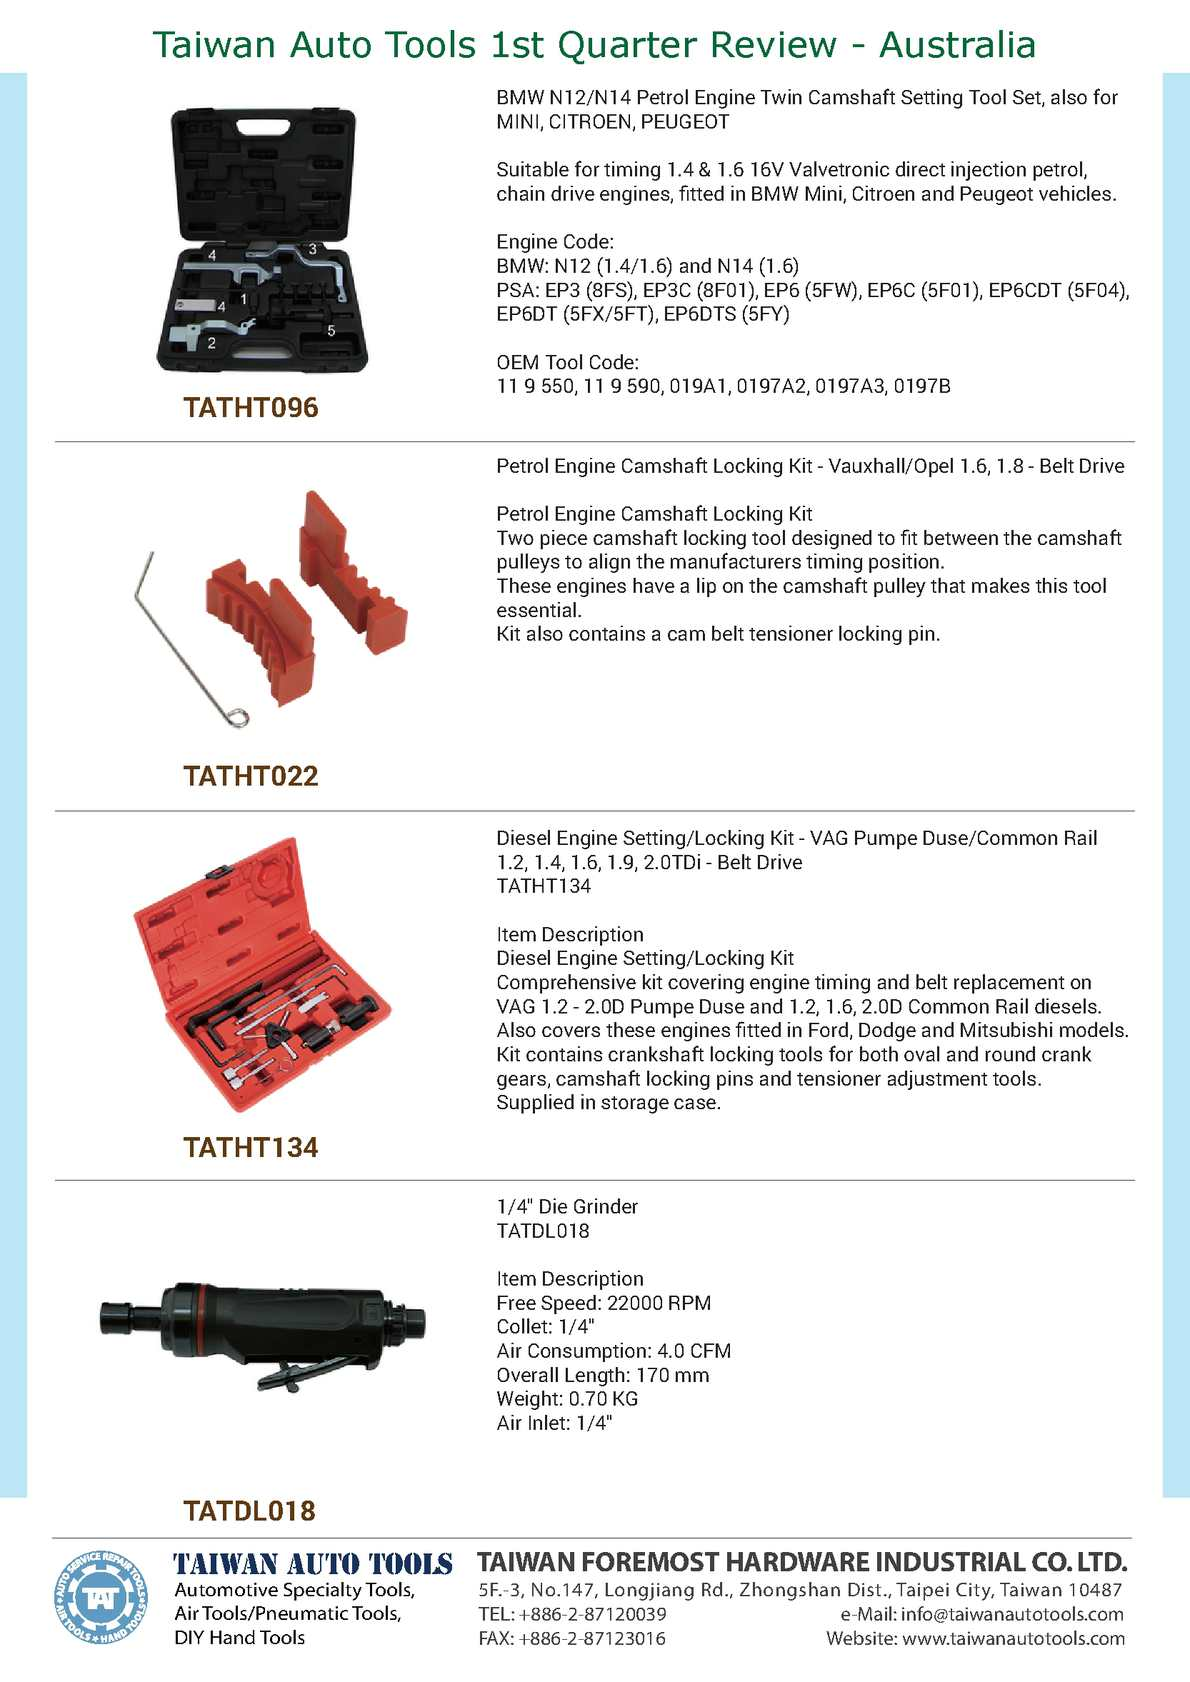 Calaméo - Taiwan Auto Tools 1st Quarter Review Australia